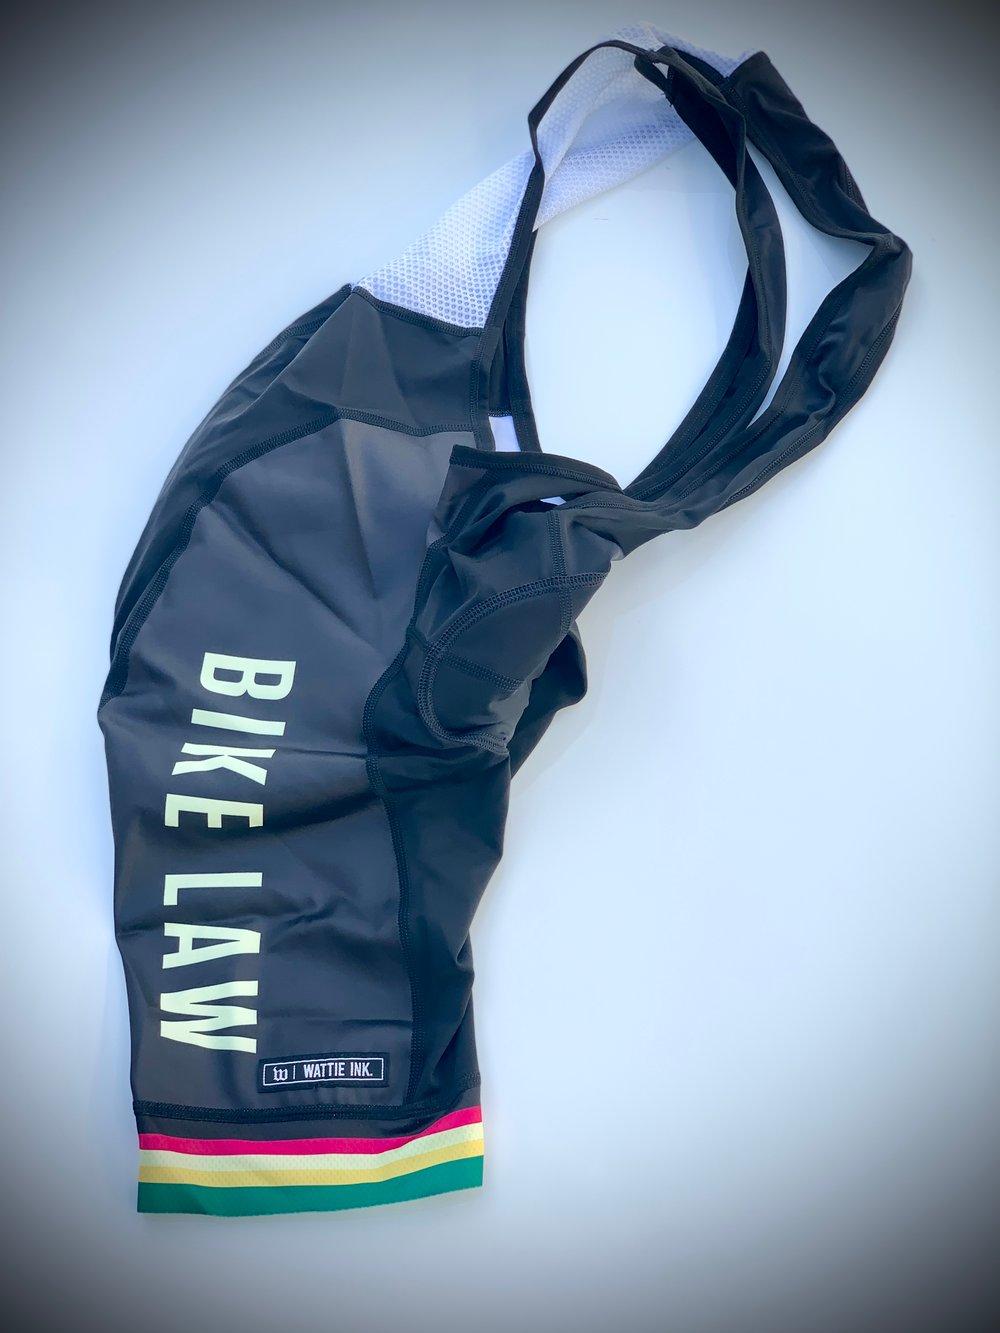 Image of Classic Edition Cycling Bib - Women's